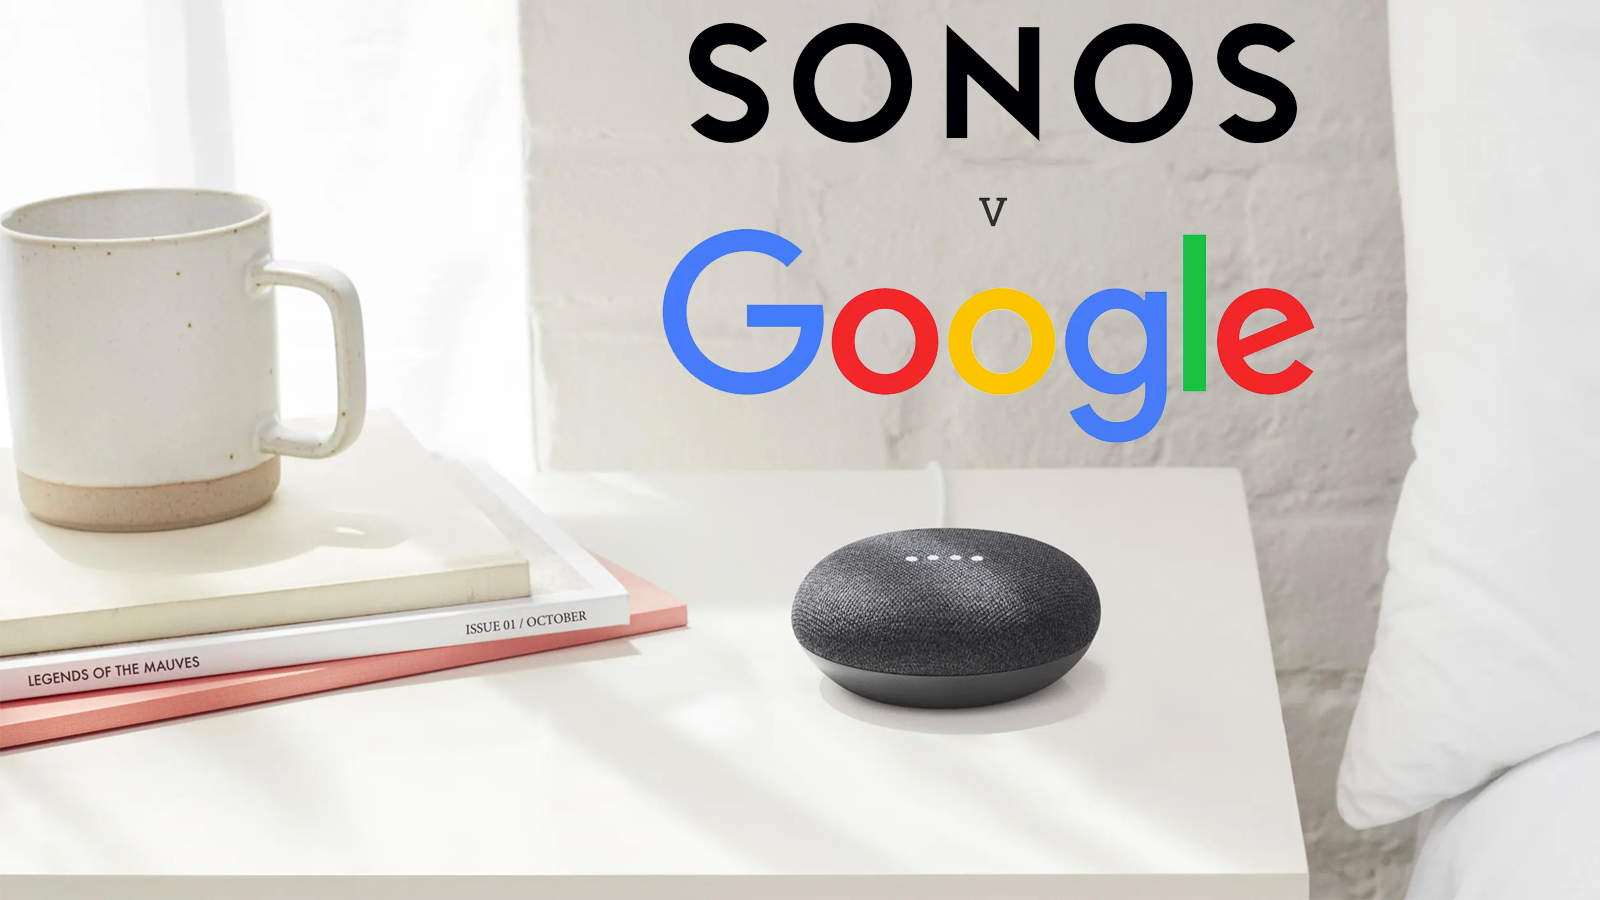 Sonos doubles down on battle with Google, files second lawsuit with new claimsRedditLinkedInRedditLinkedIn